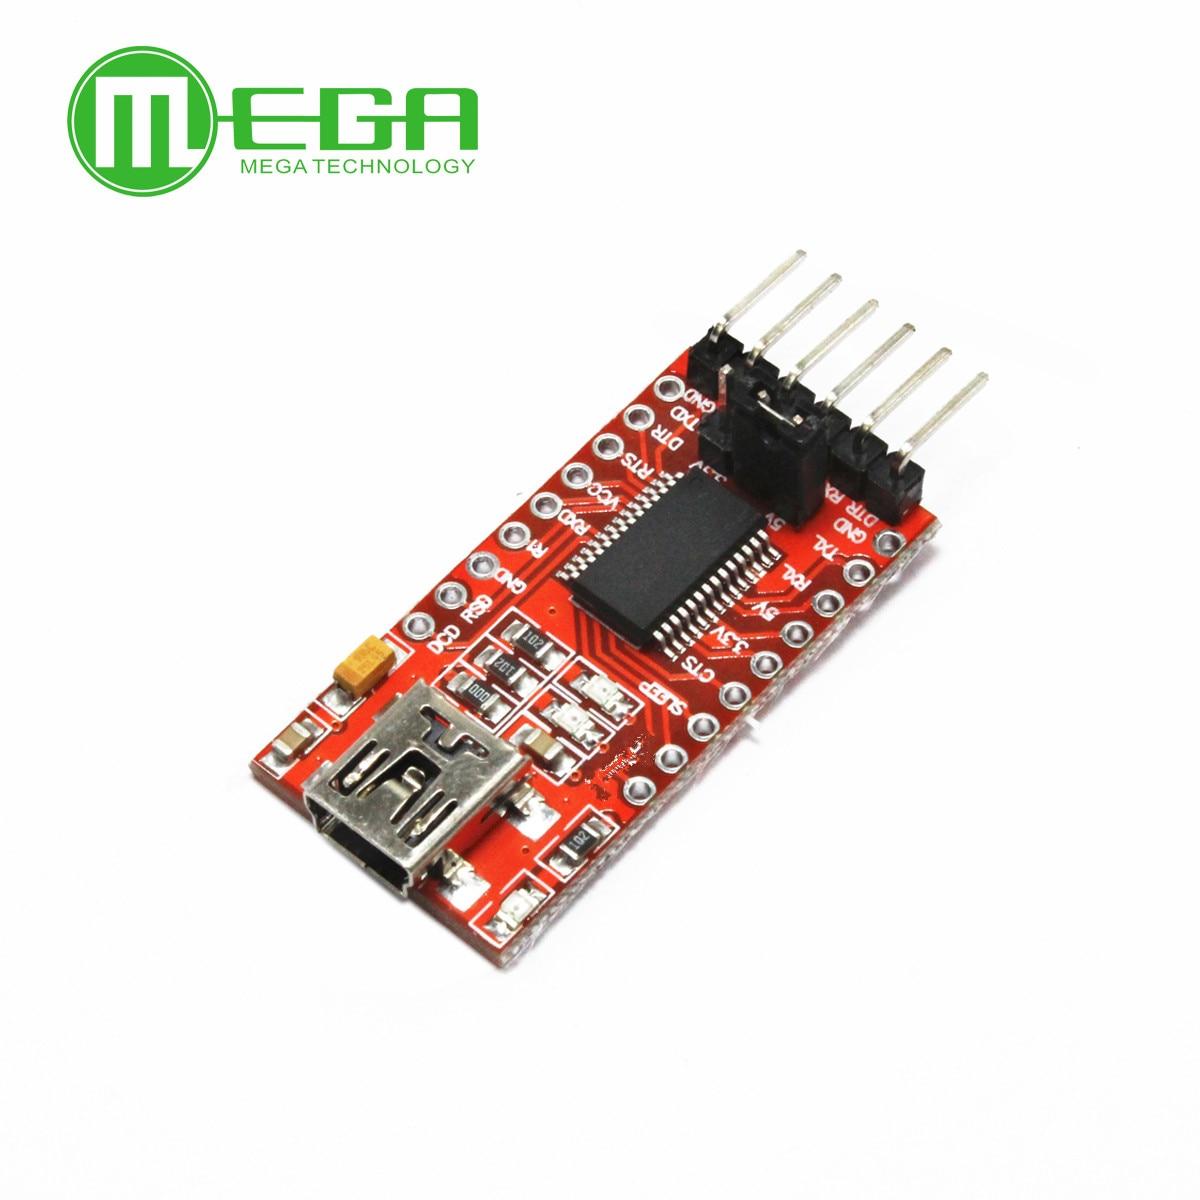 1 шт., FT232RL FT232 FTDI USB 3,3 V 5,5 V к TTL Серийный адаптер модуль для A-rduino мини-порт